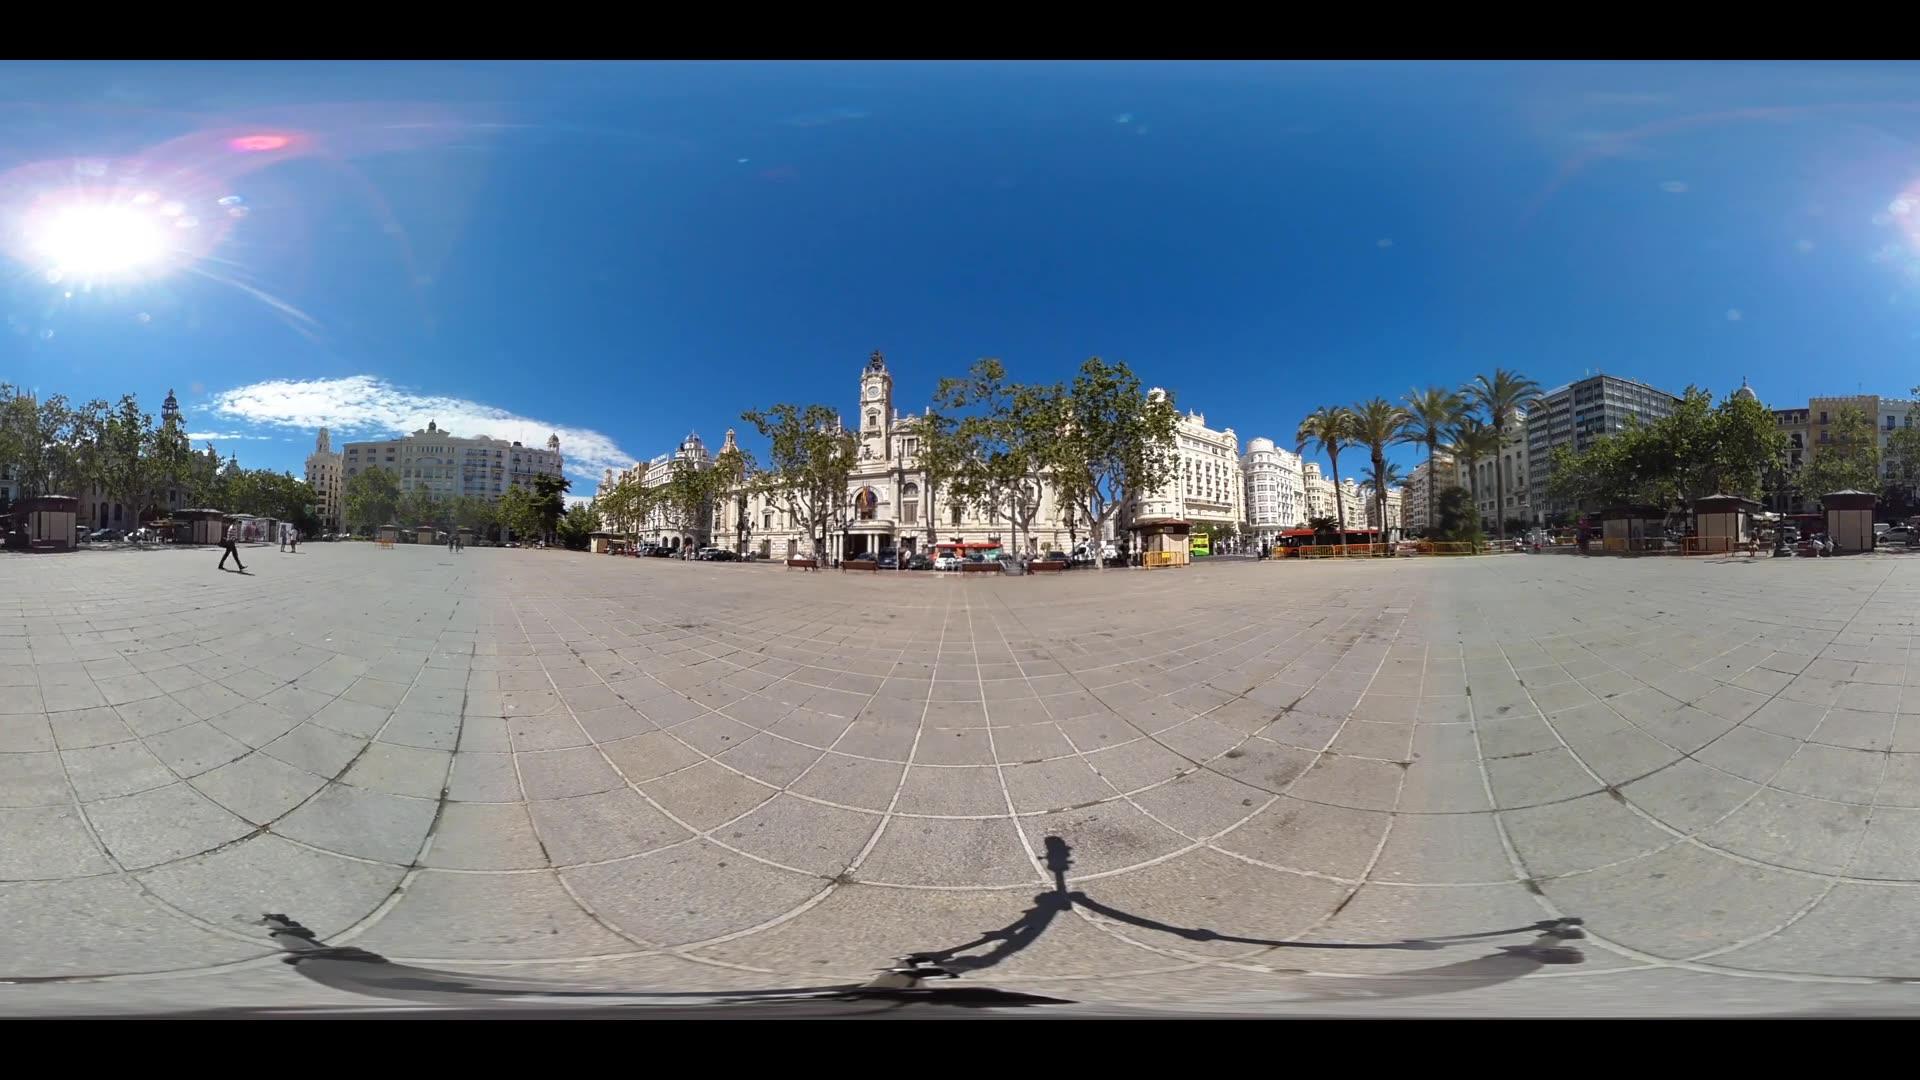 Virtual Reality 360 view from plaza Ayuntamiento De Valencia in Spain